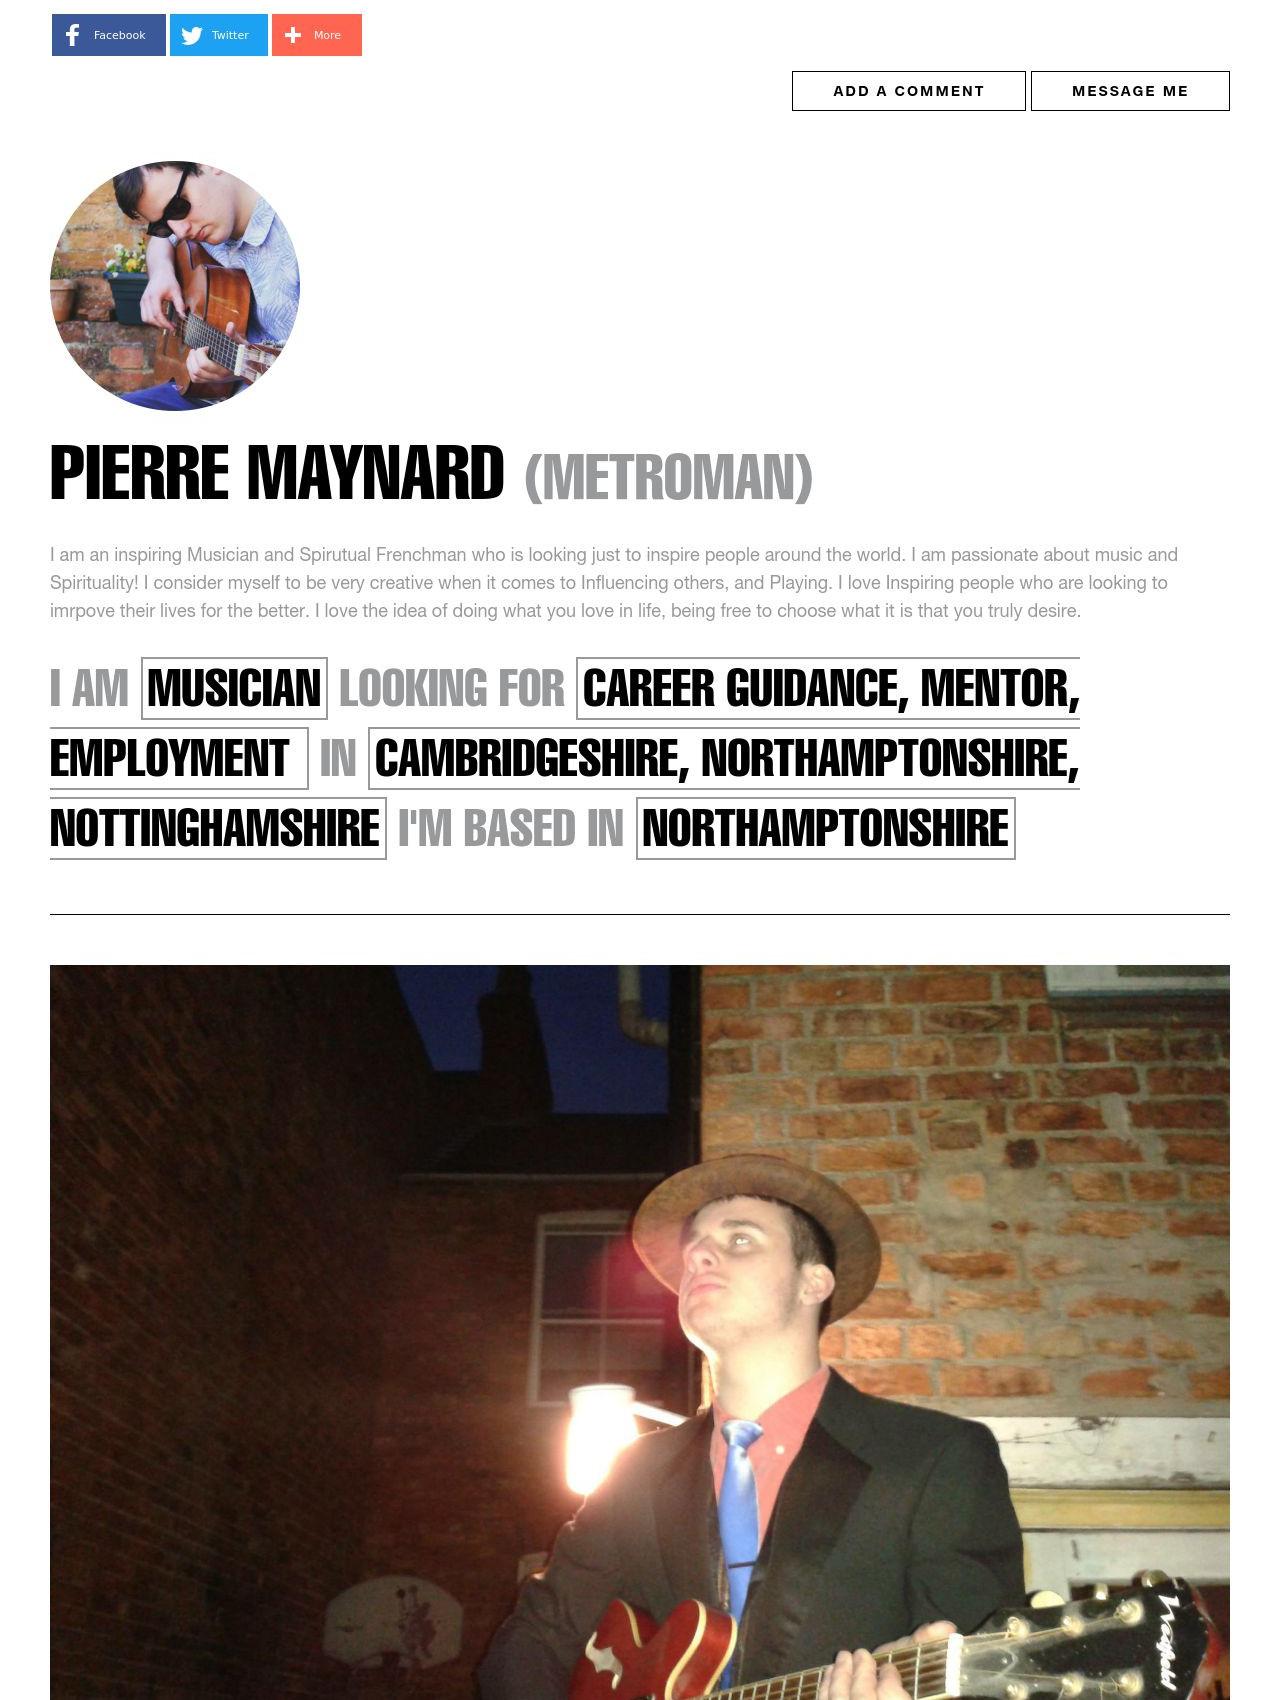 Pierre Maynard